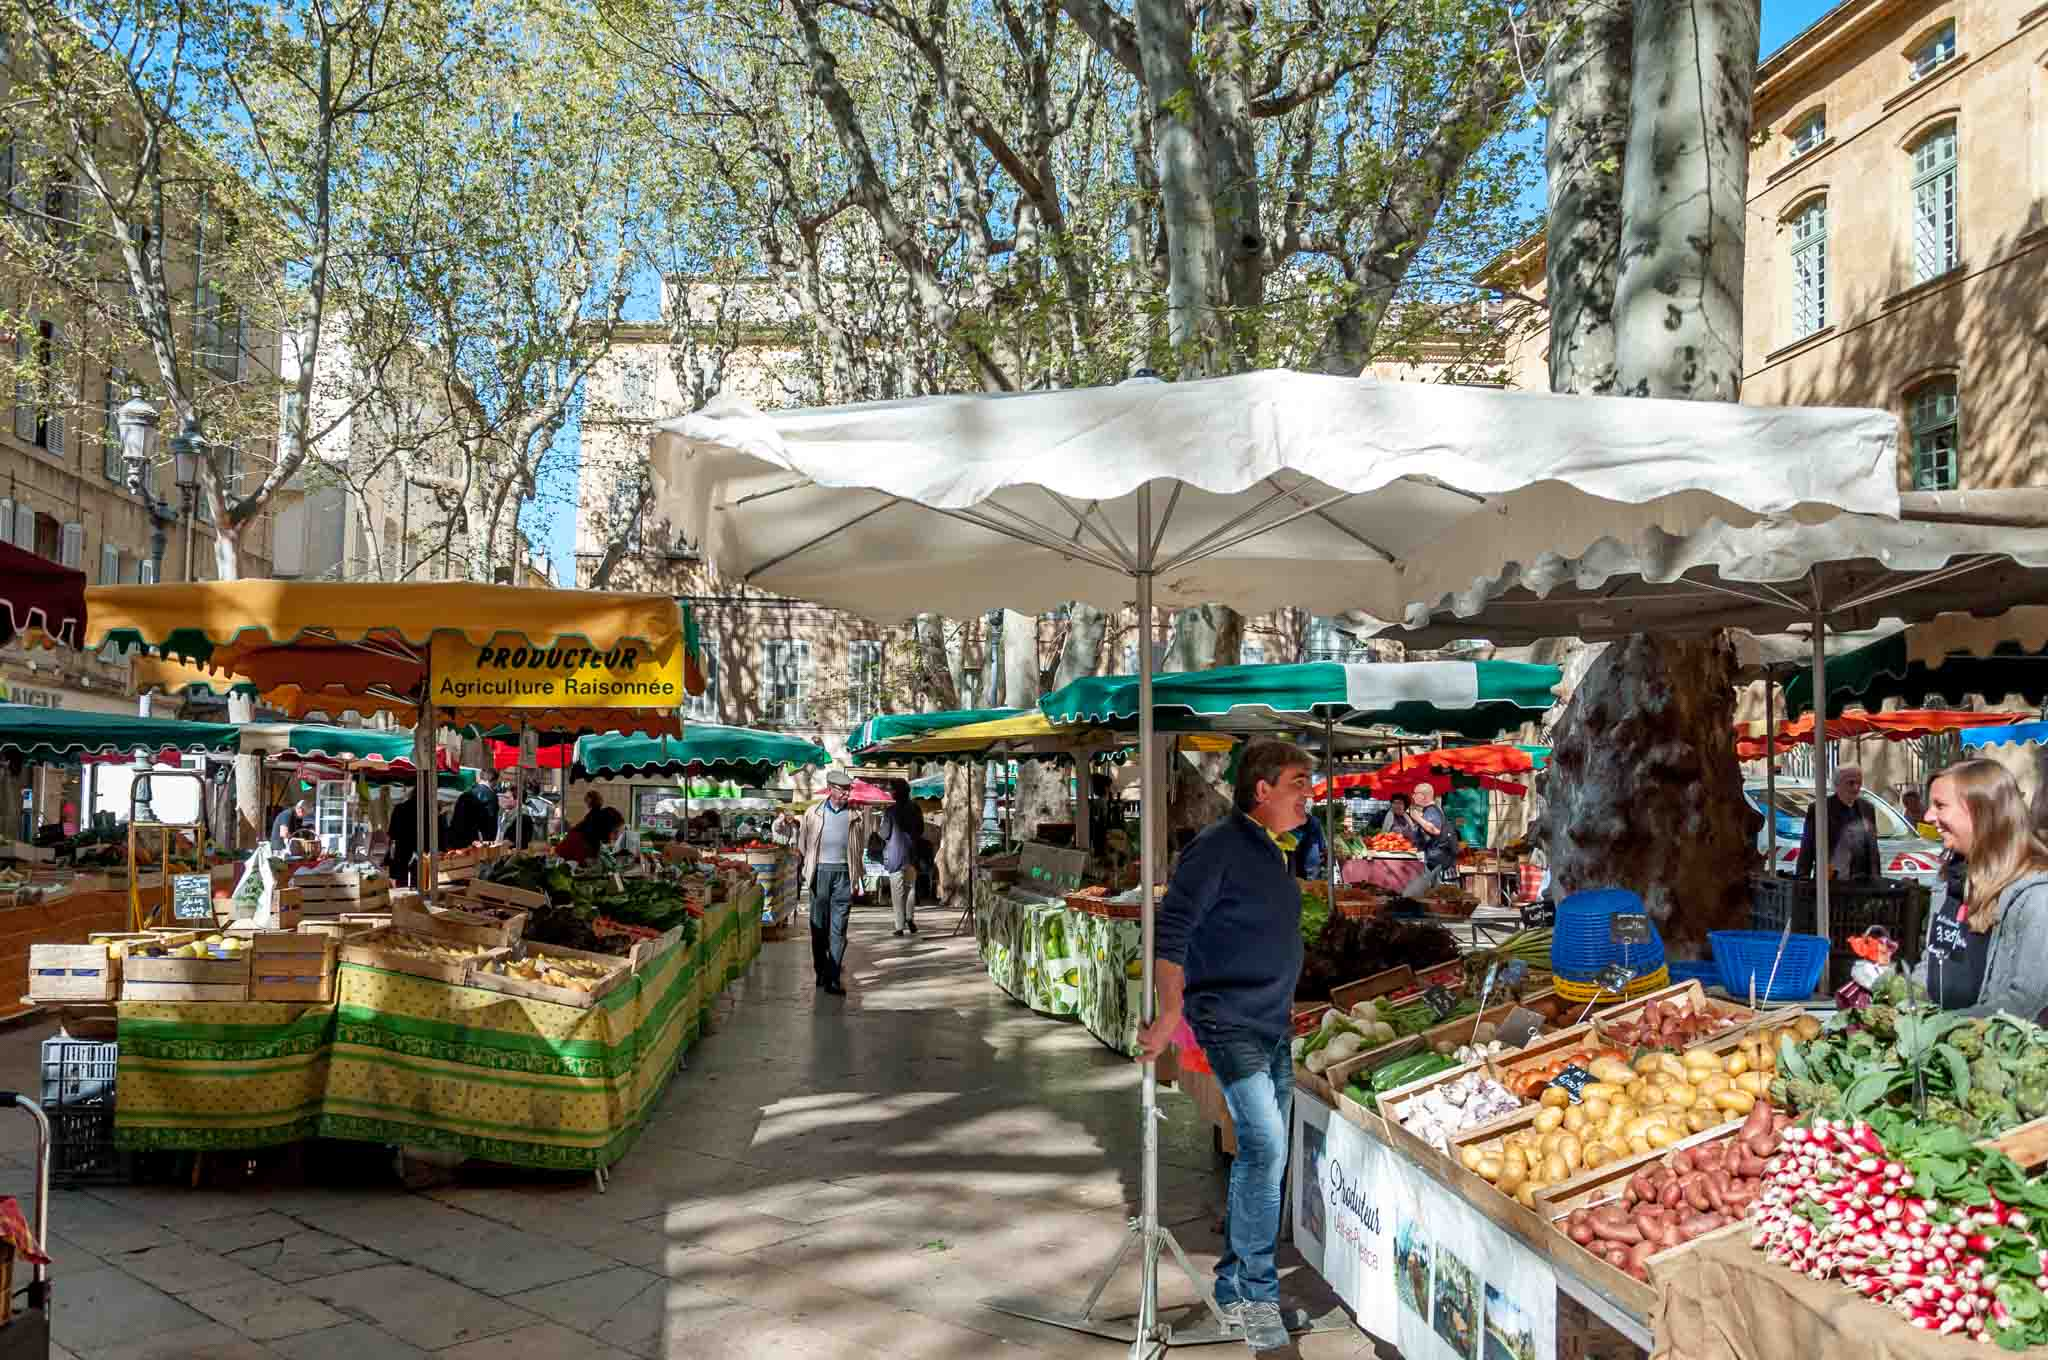 Produce vendors in a city square